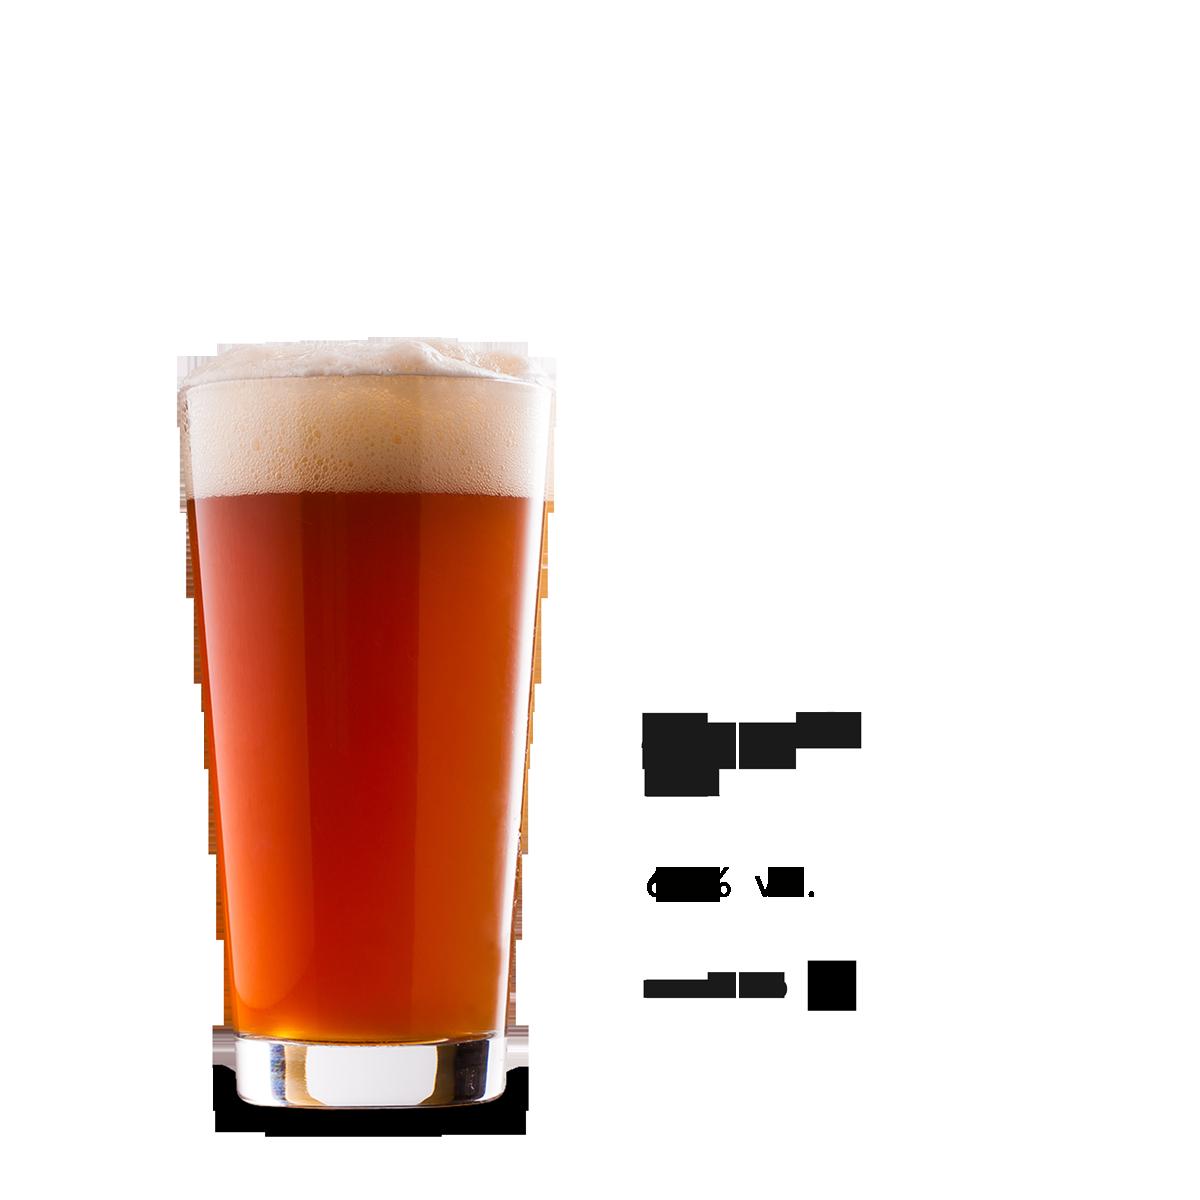 jacaranda_new_2018_italian_craft_brewery_renton.png